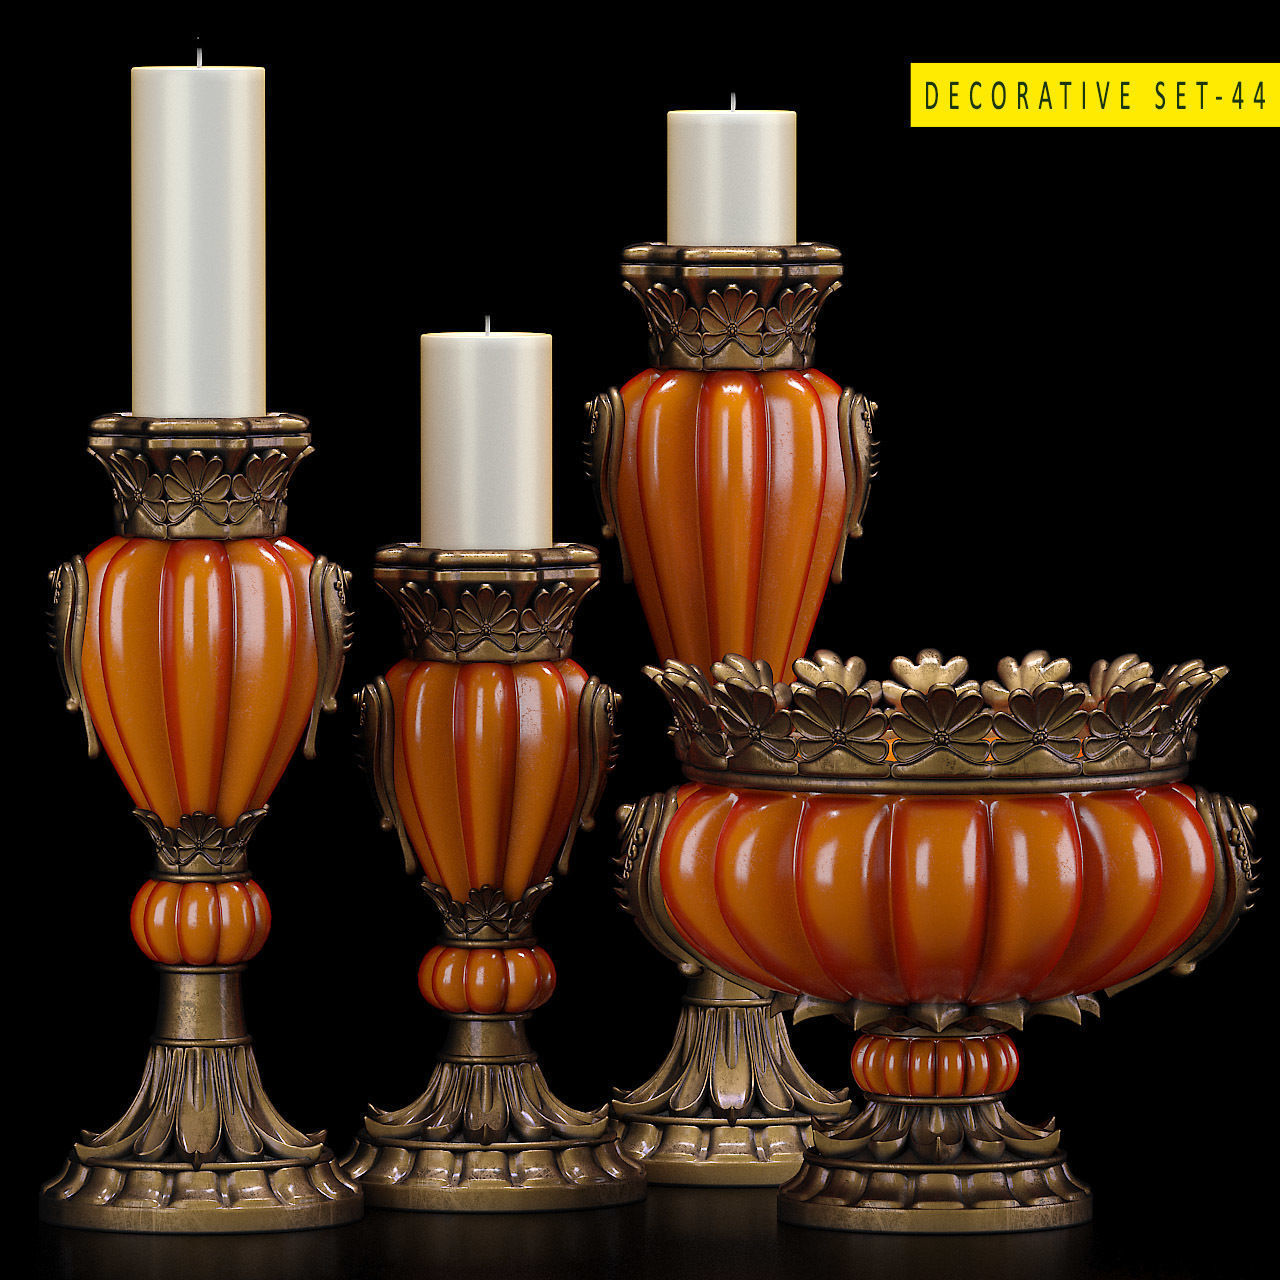 Decorative set 44